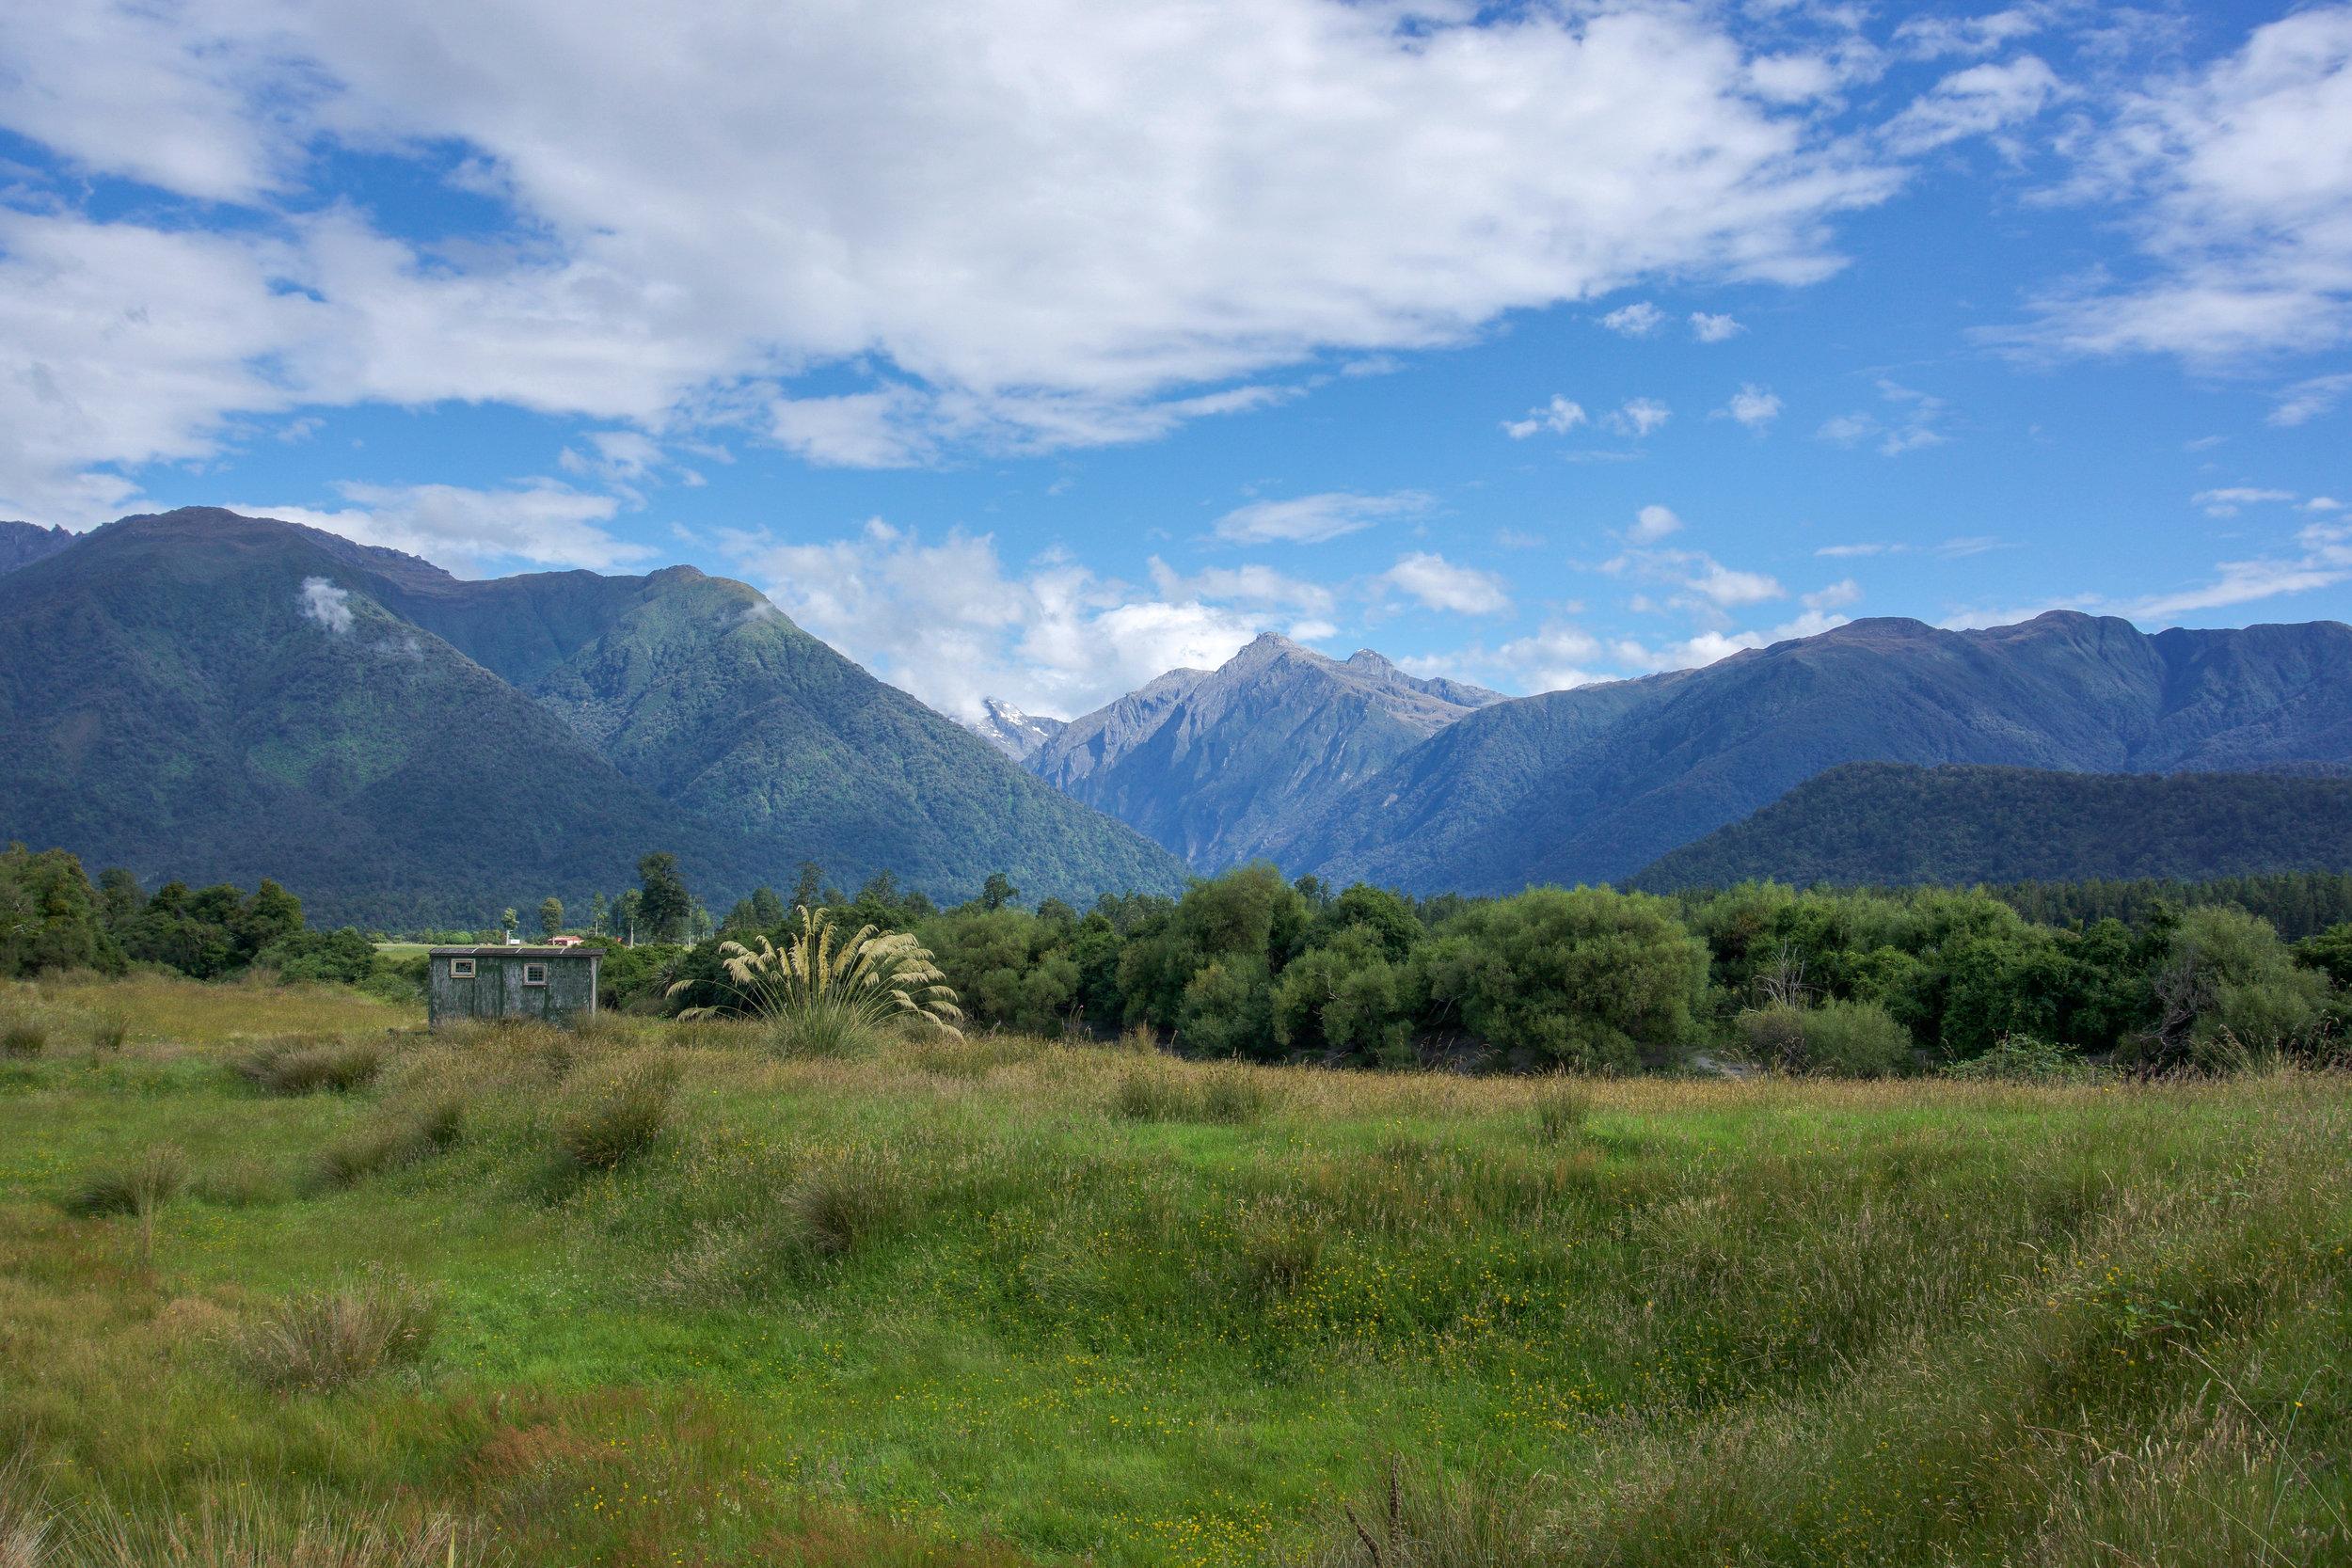 New Zealand - Drive to Wanaka